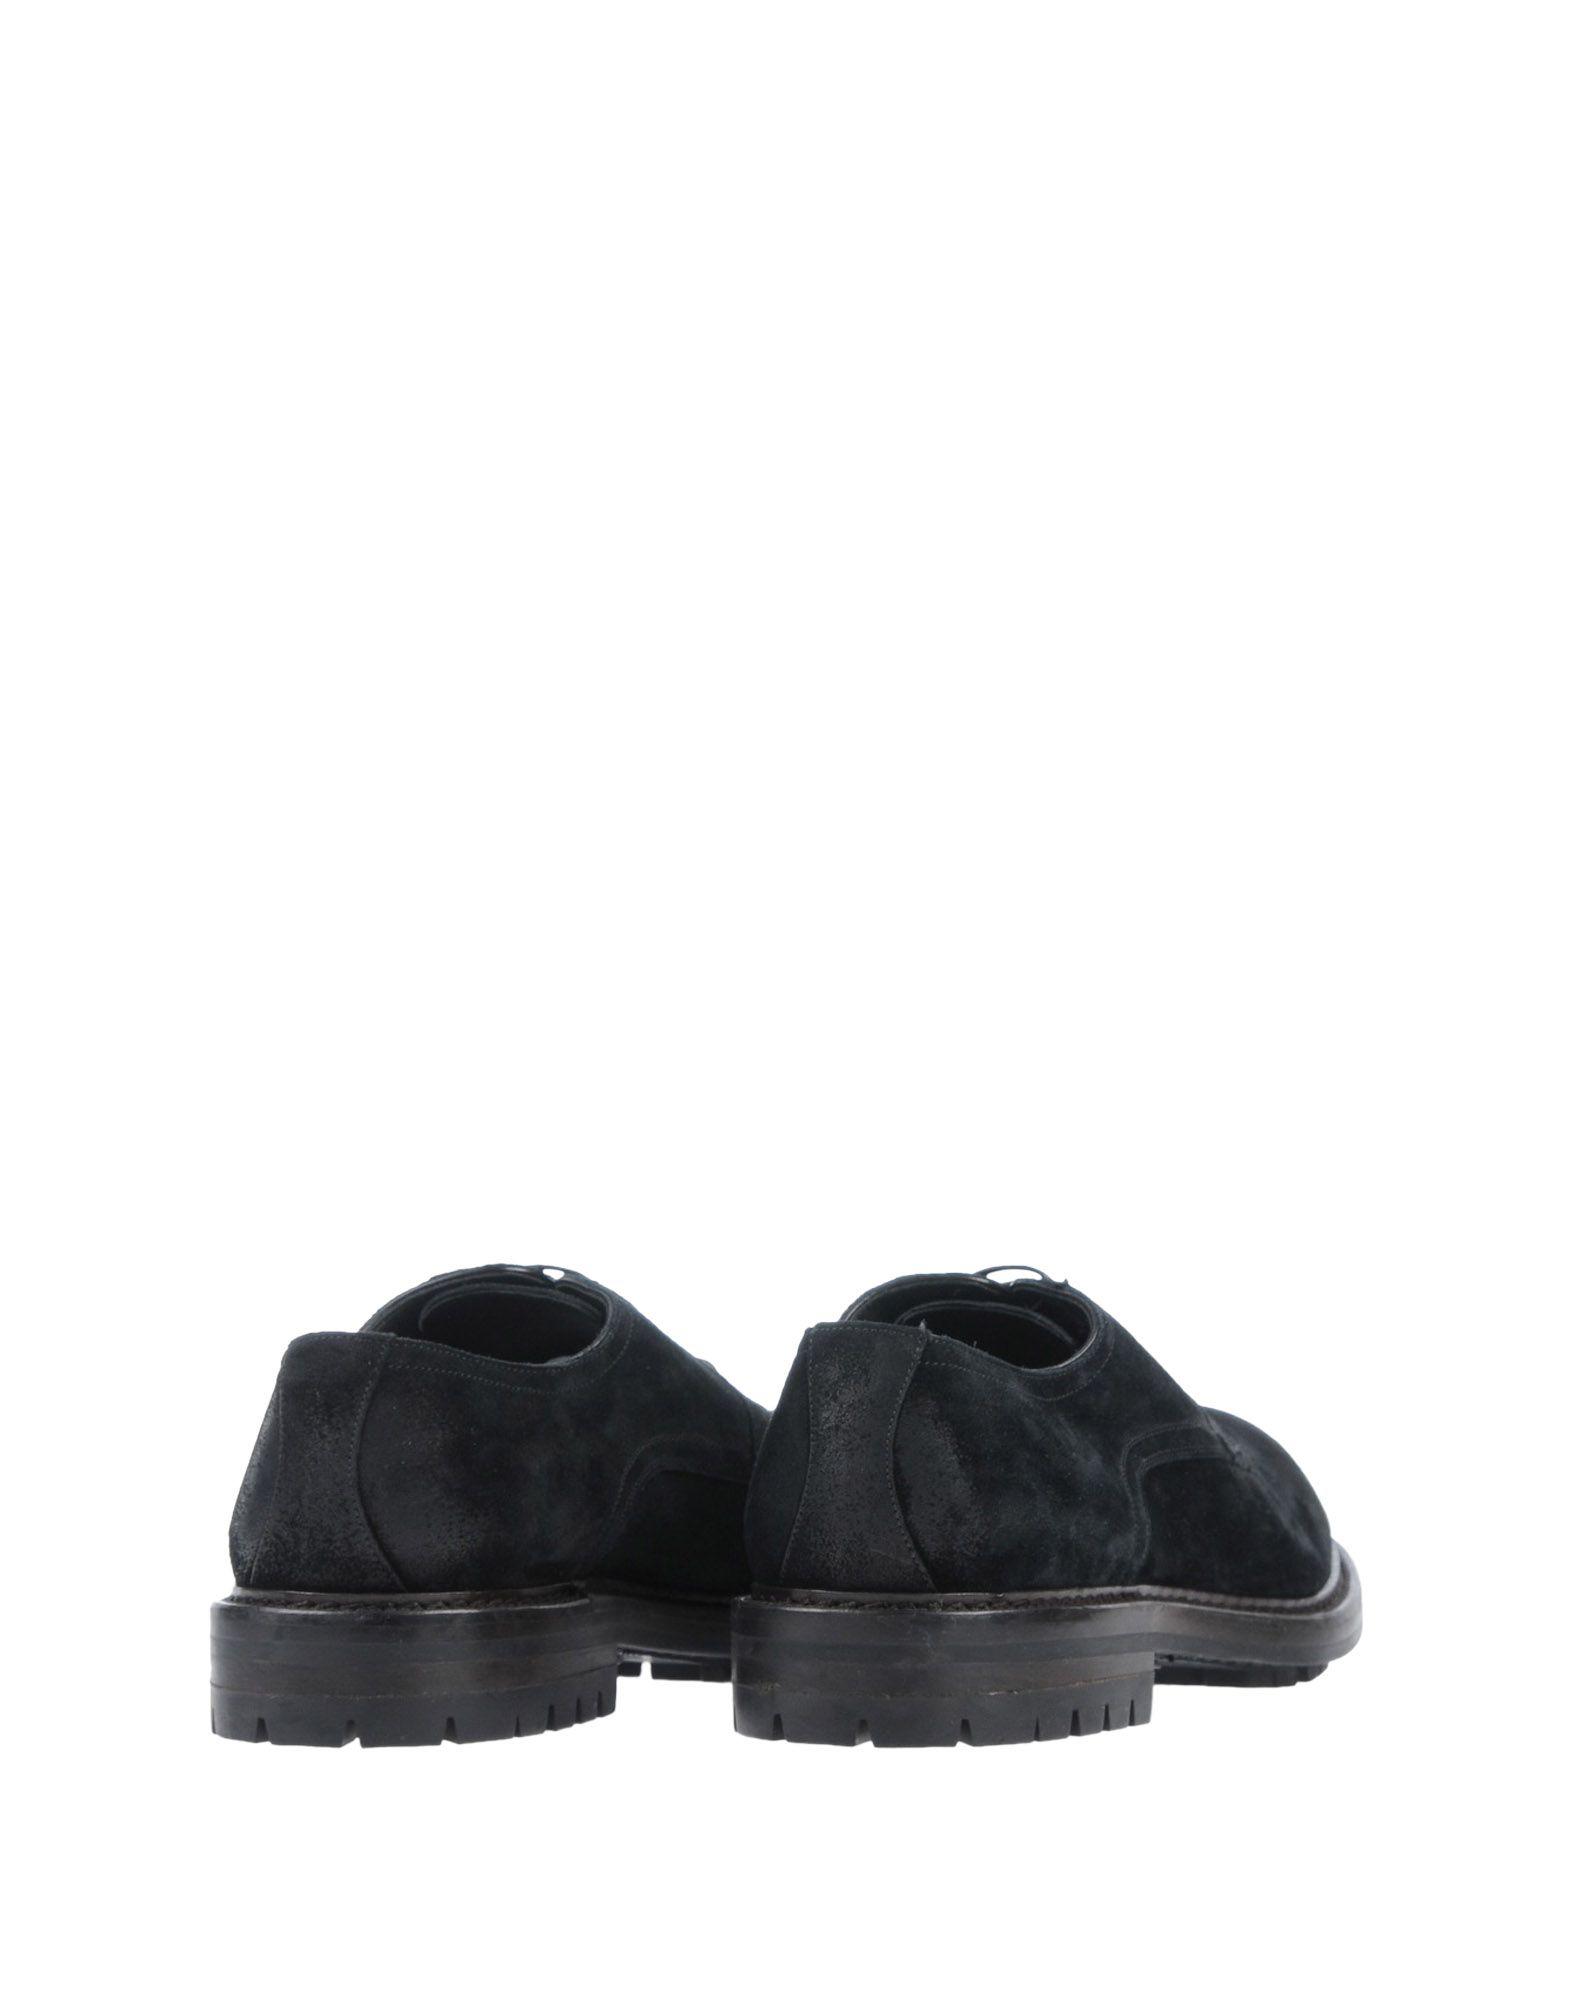 Dolce  & Gabbana Schnürschuhe Herren  Dolce 11465957DA Gute Qualität beliebte Schuhe ce4aea